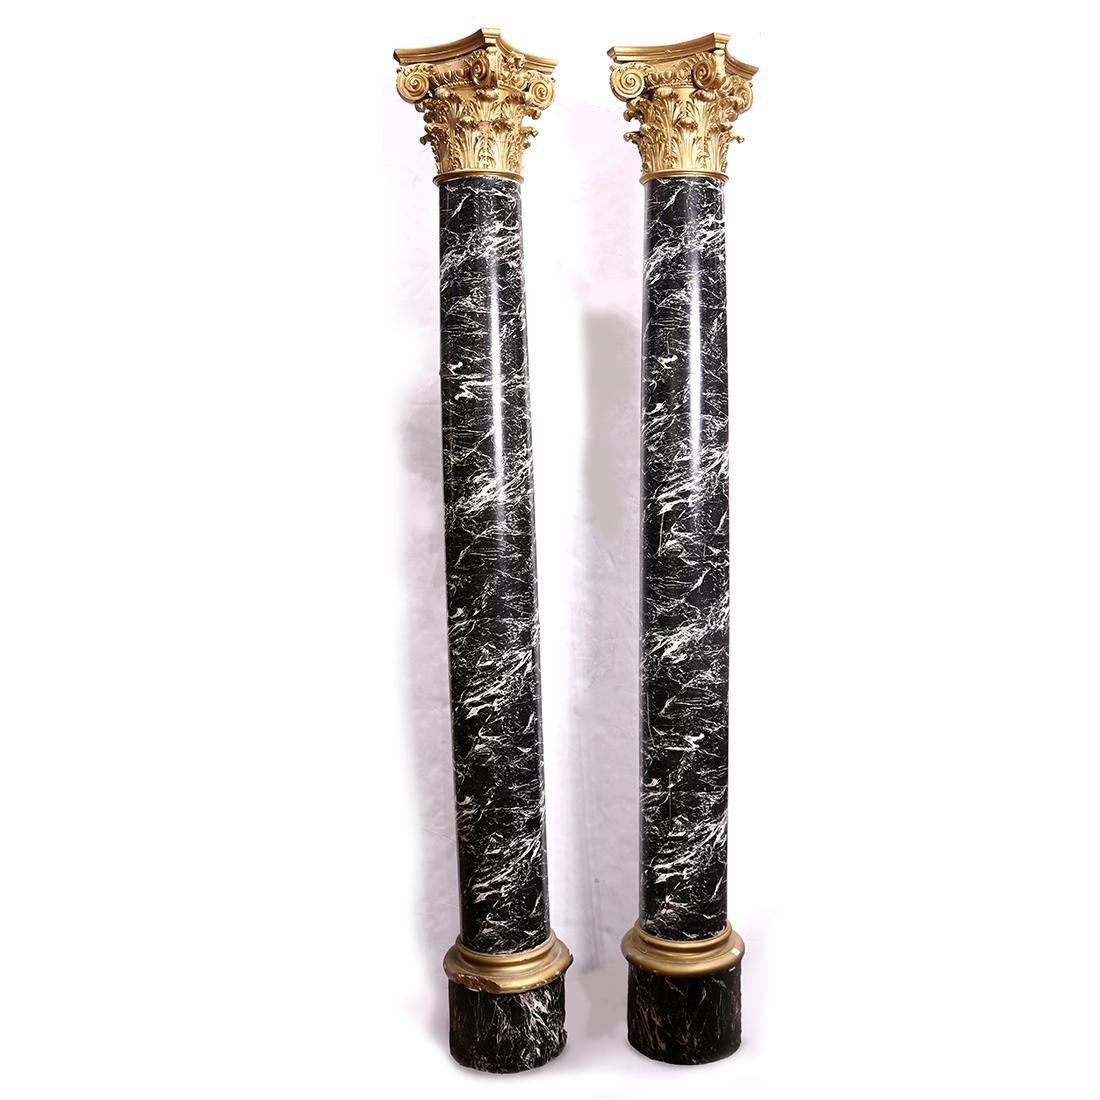 Pair of faux marble Corinthian columns